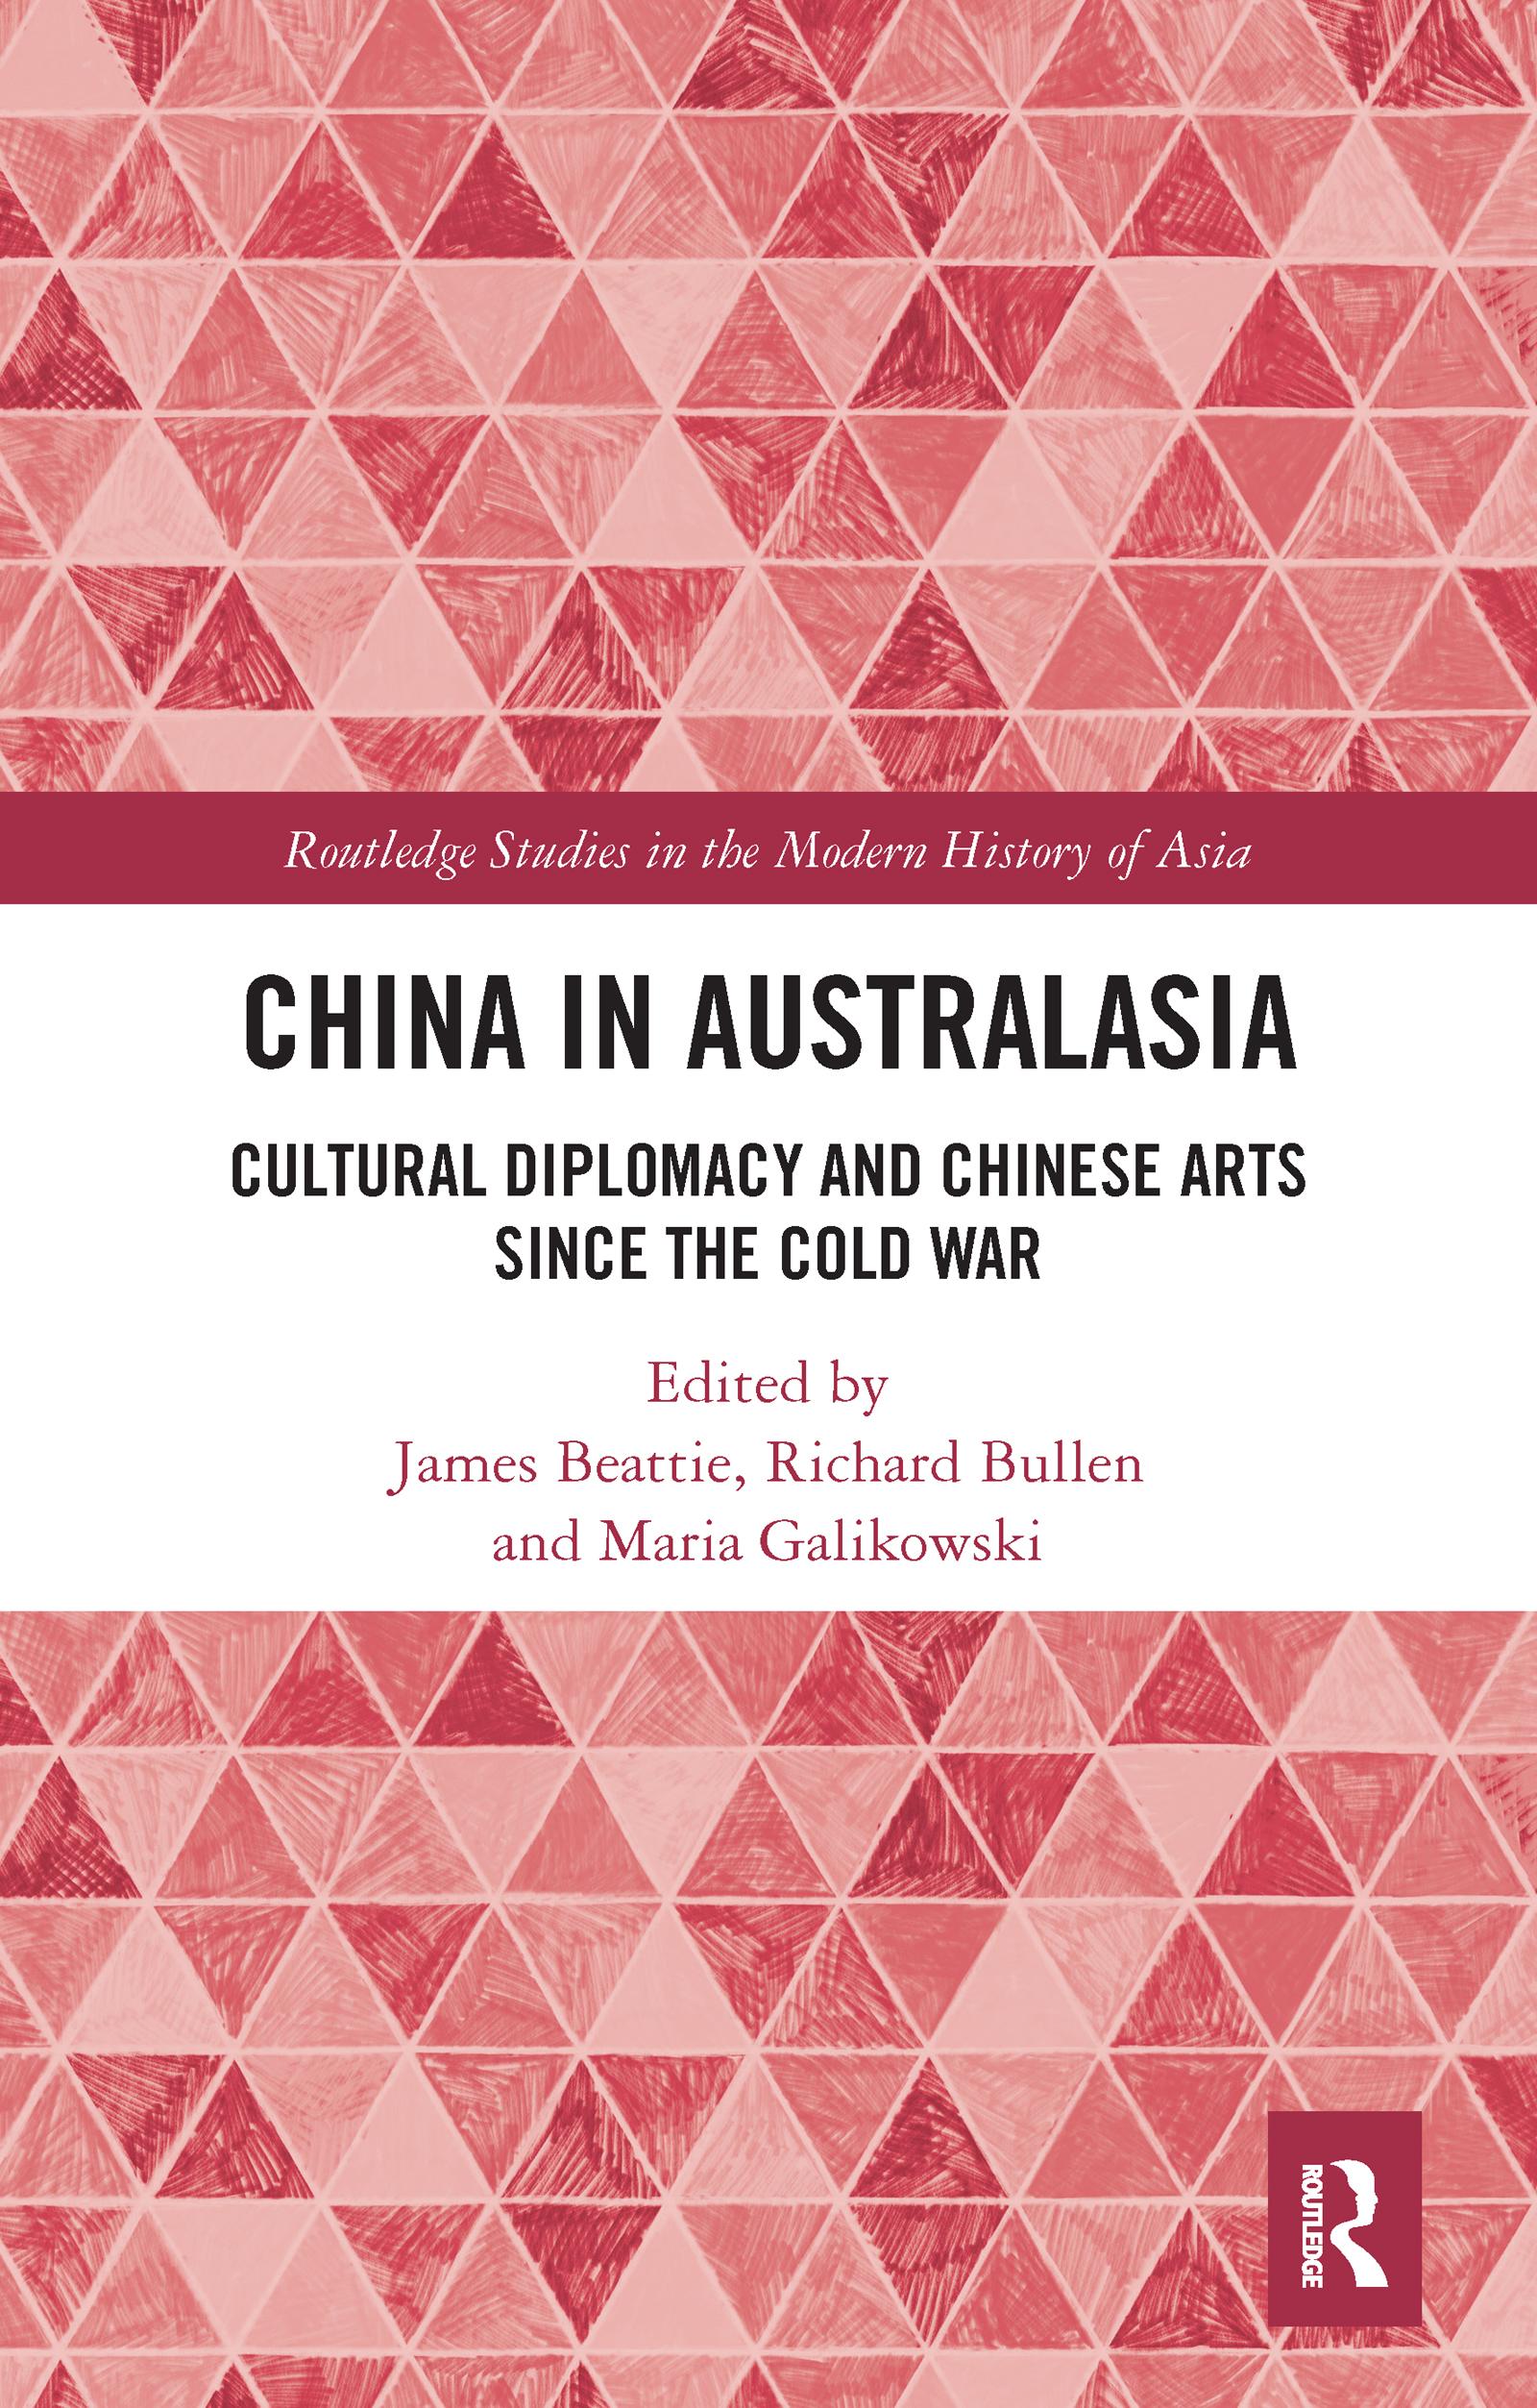 China in Australasia